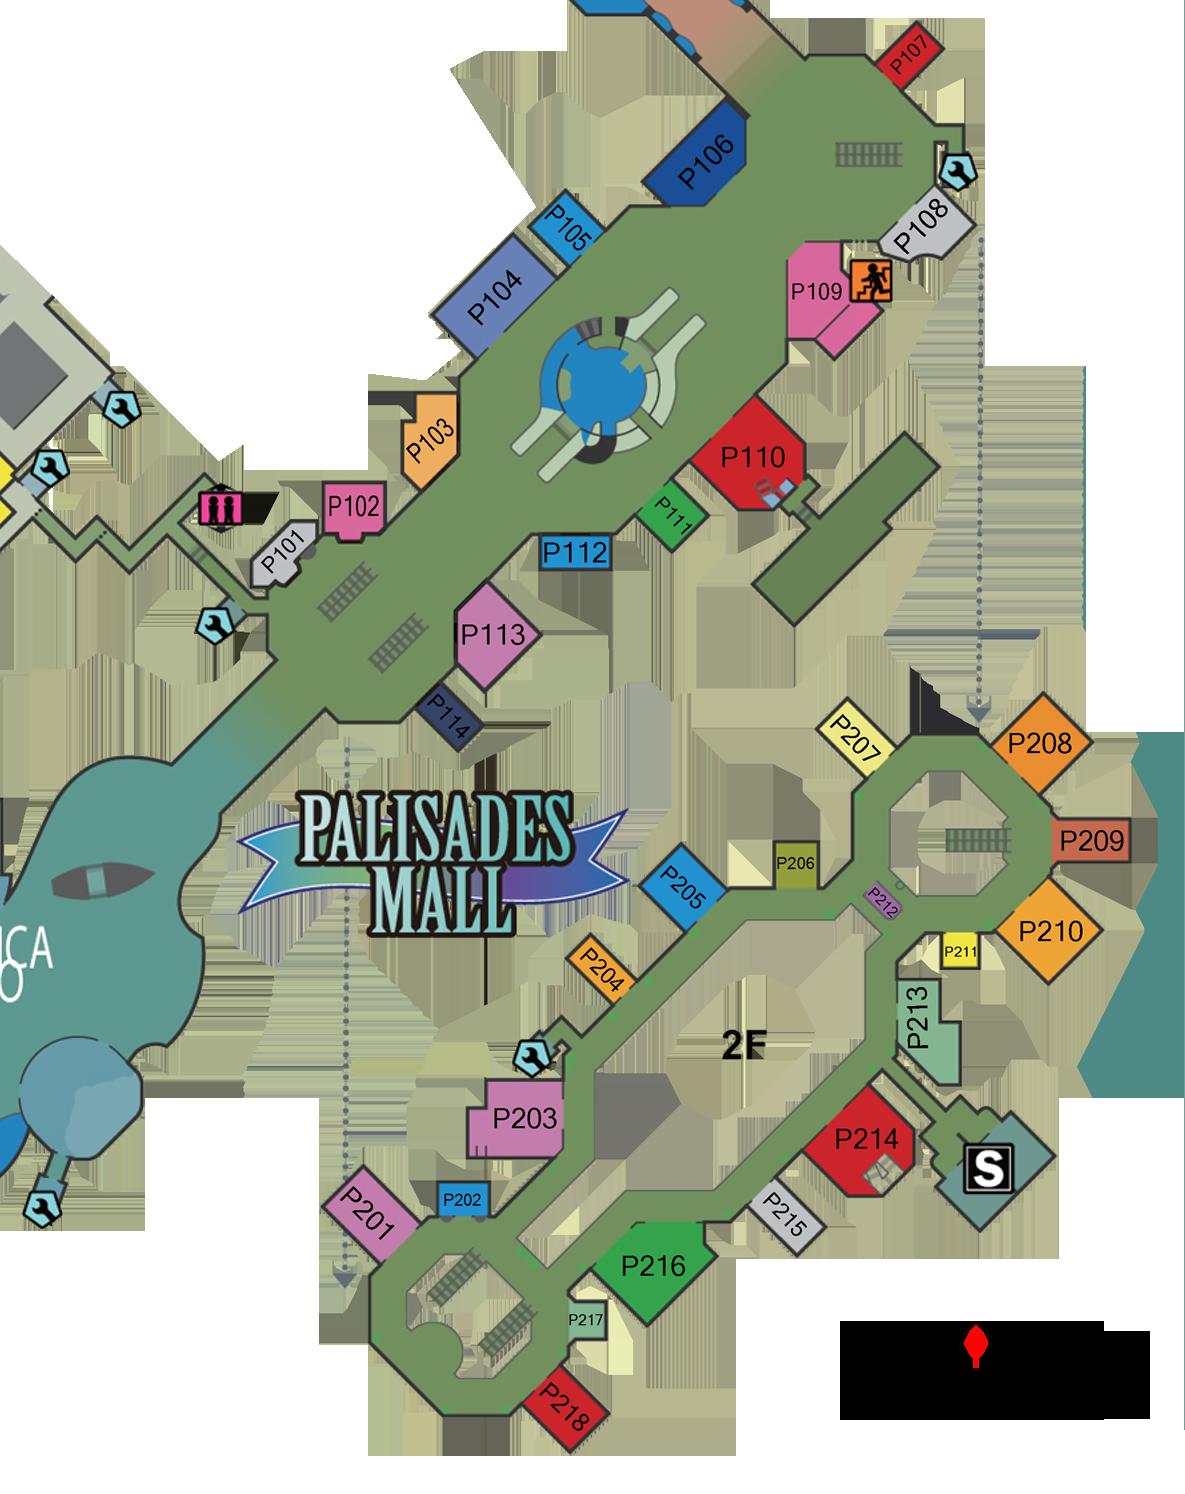 Palisades Center Mall Map